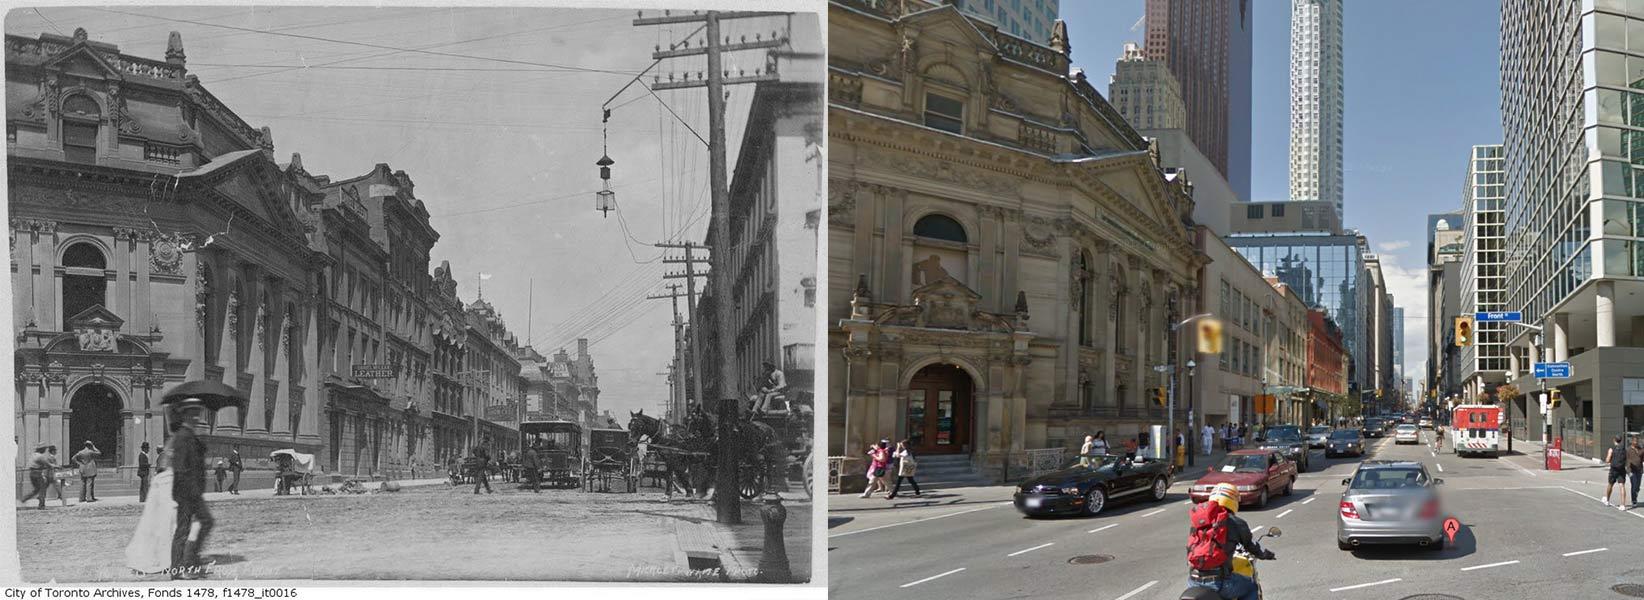 Yonge Street and Front Street Toronto